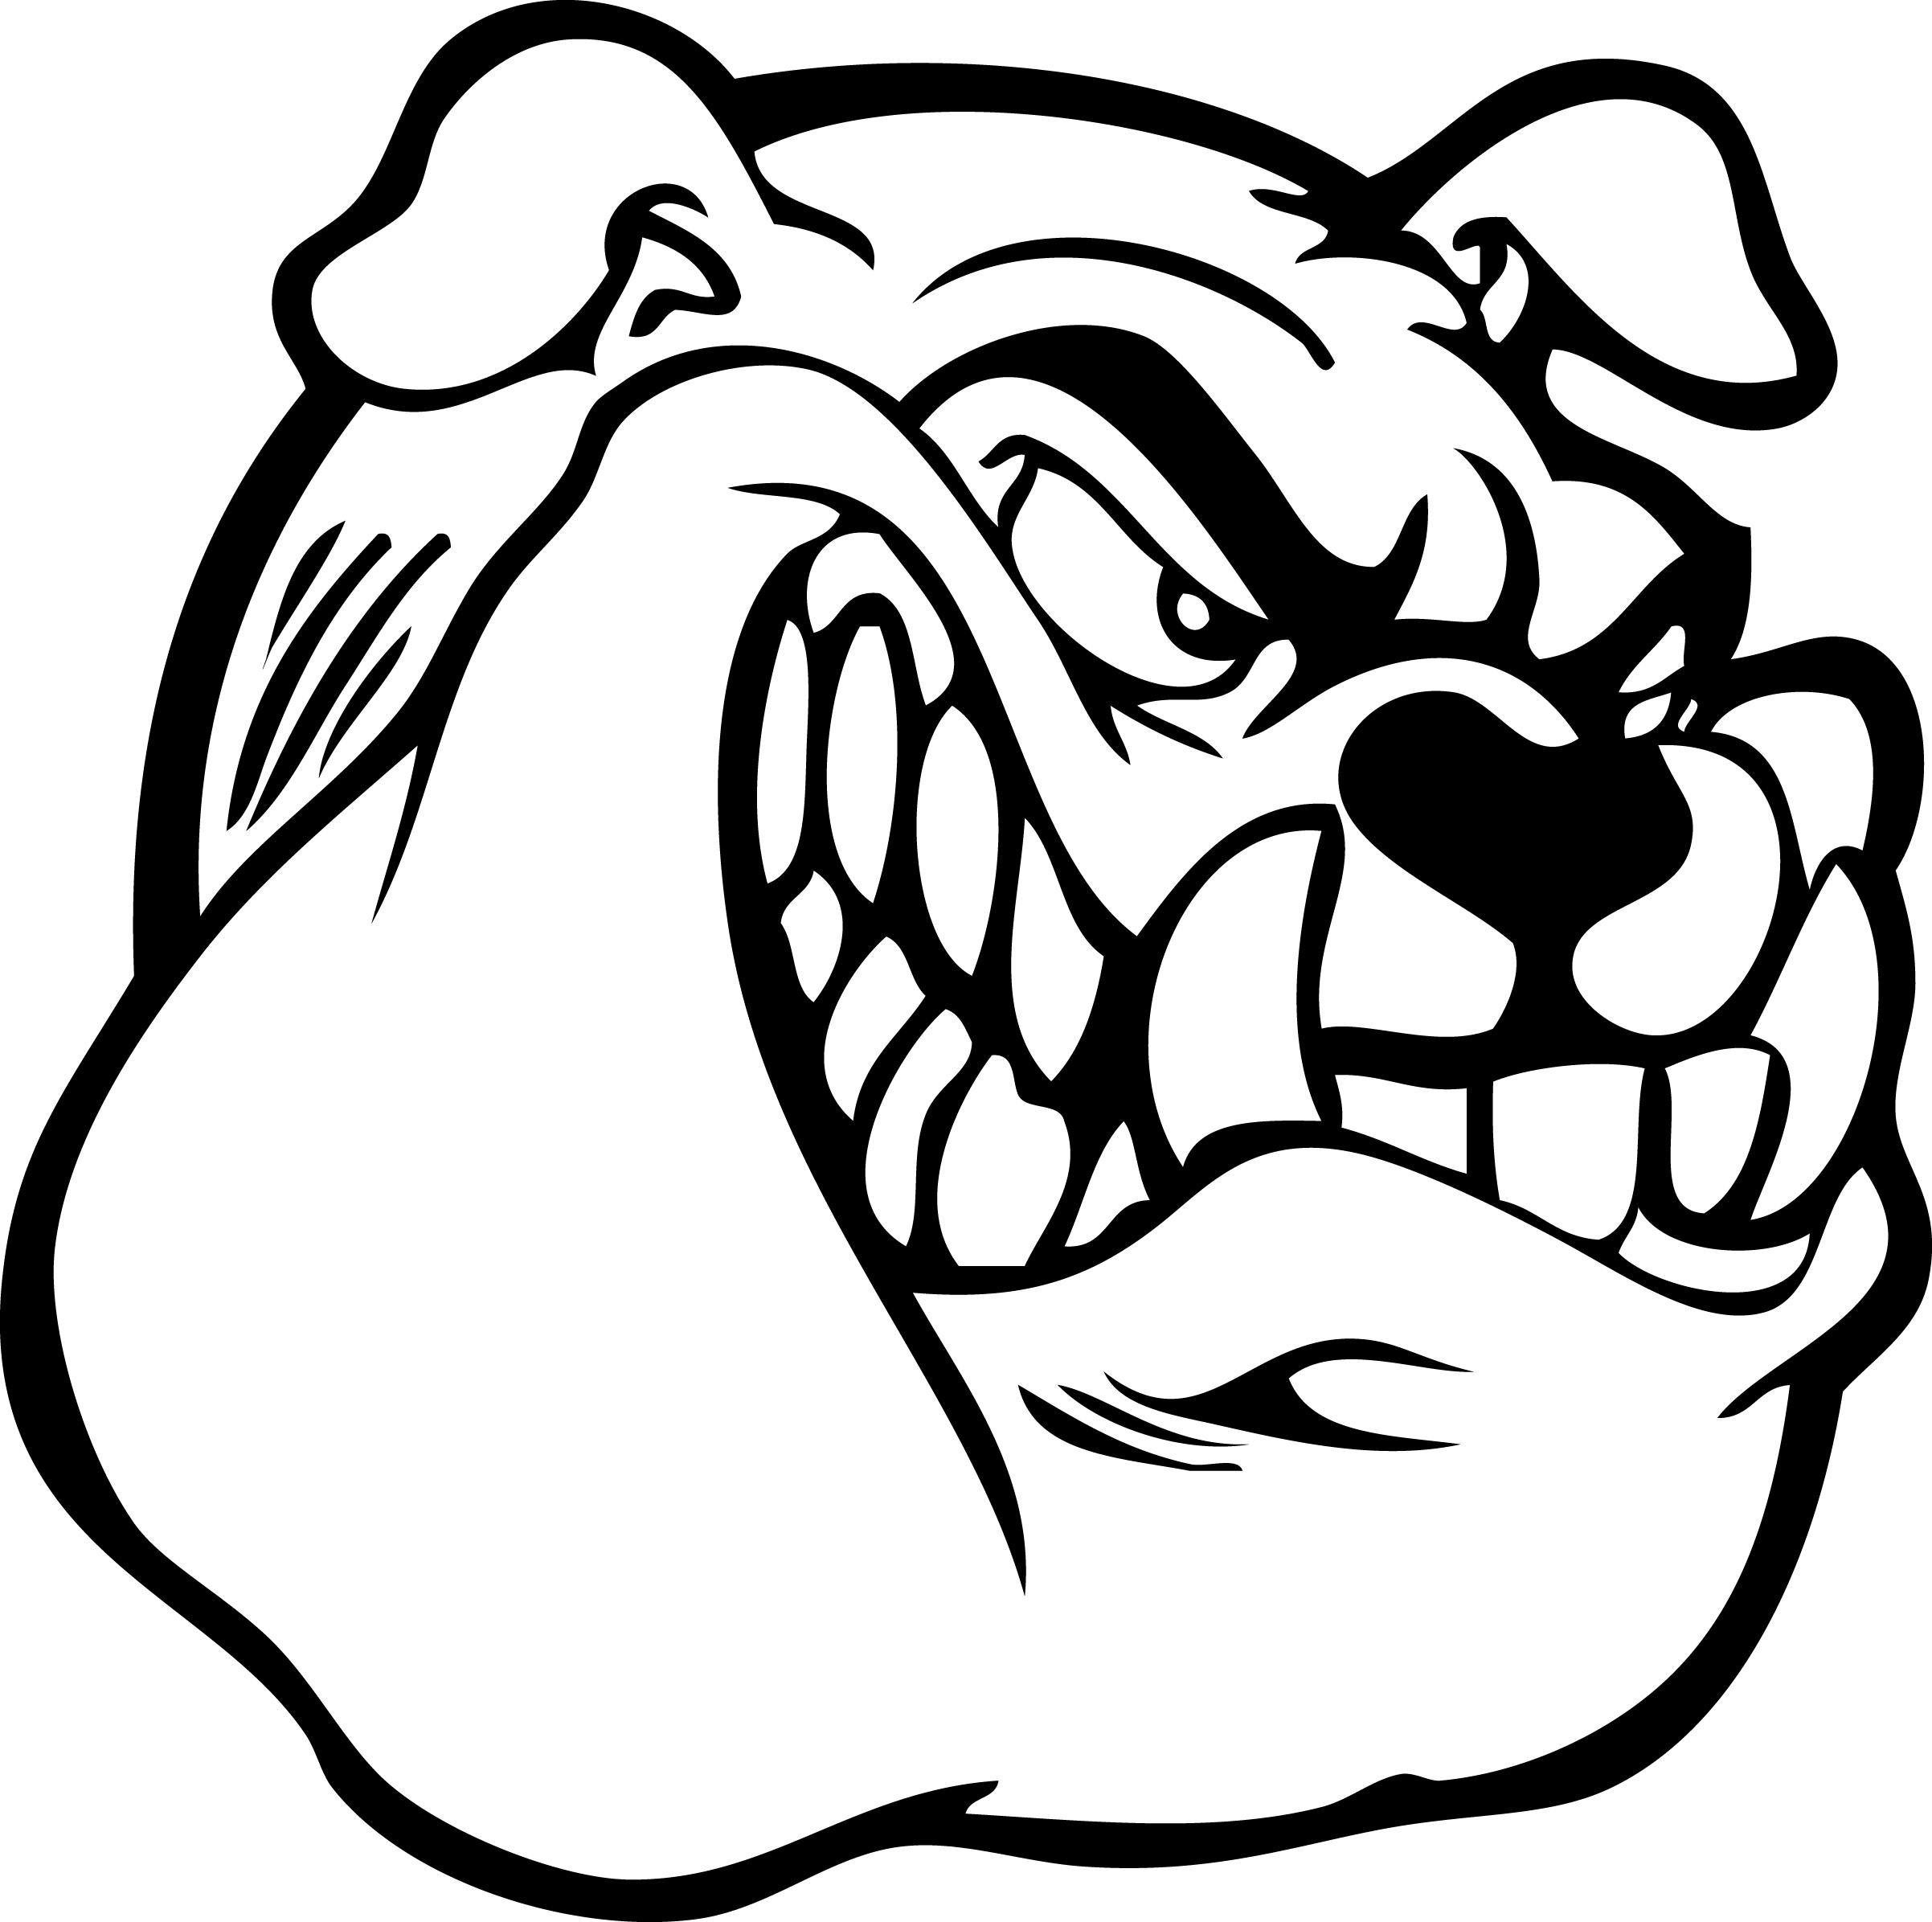 Bulldog Mascots Clipart